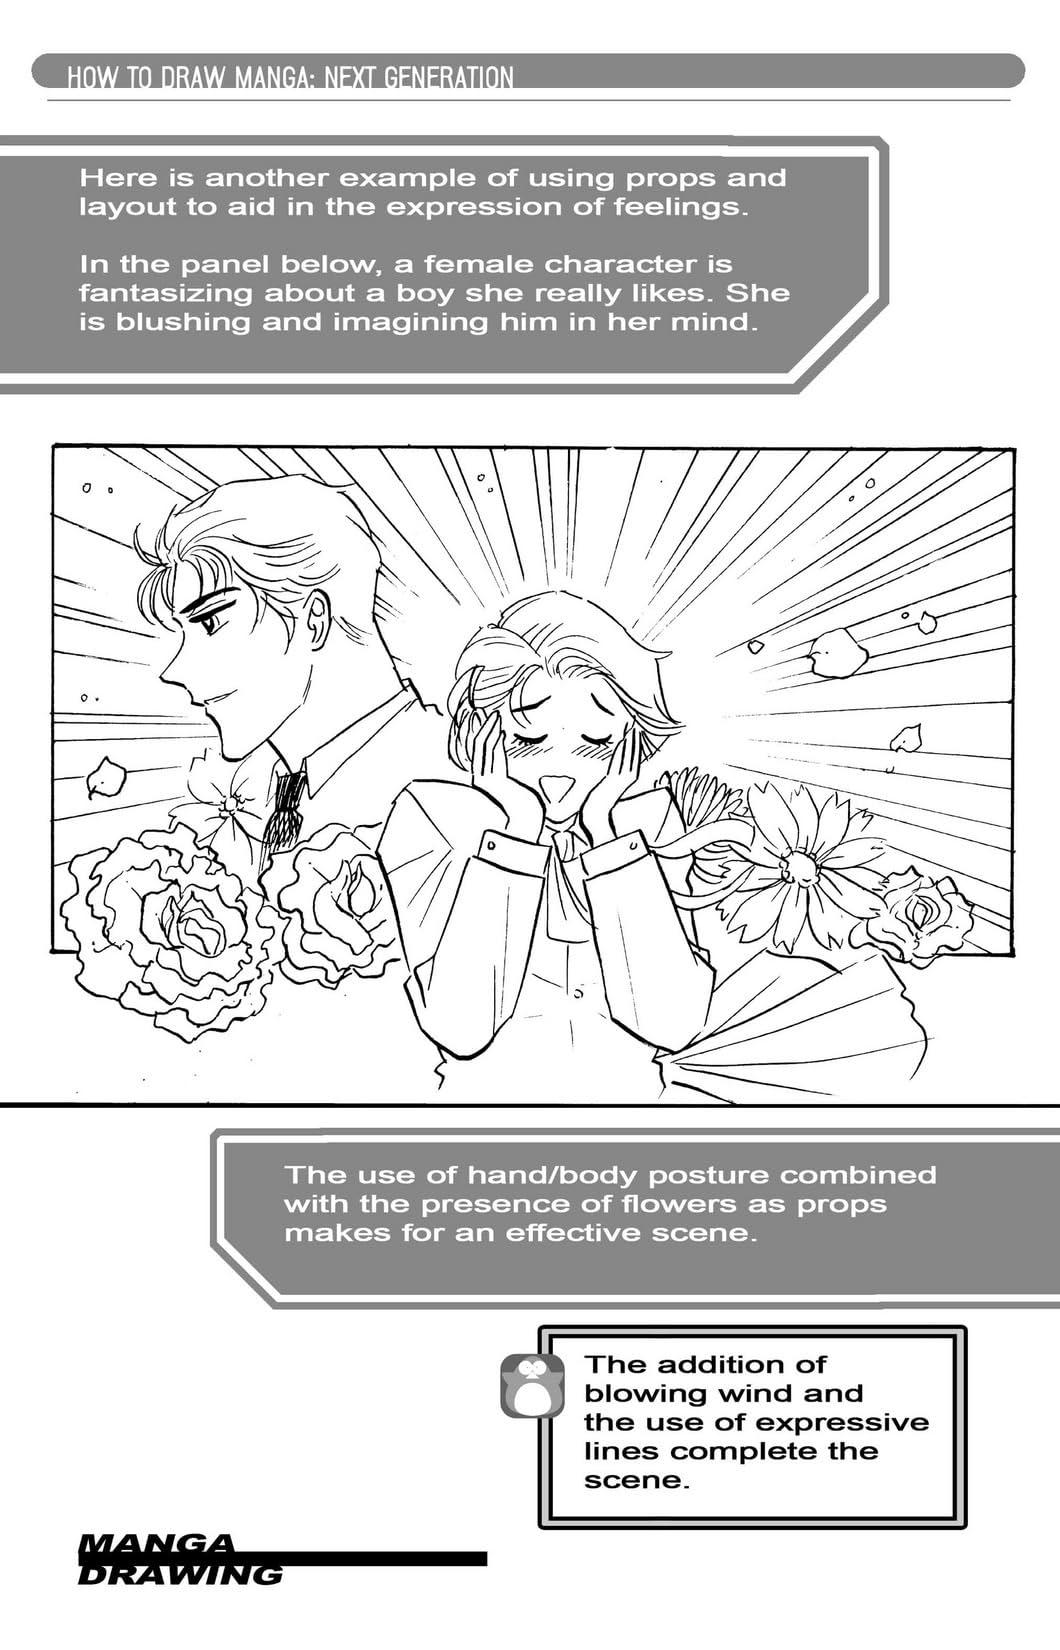 How To Draw Manga Vol. 10